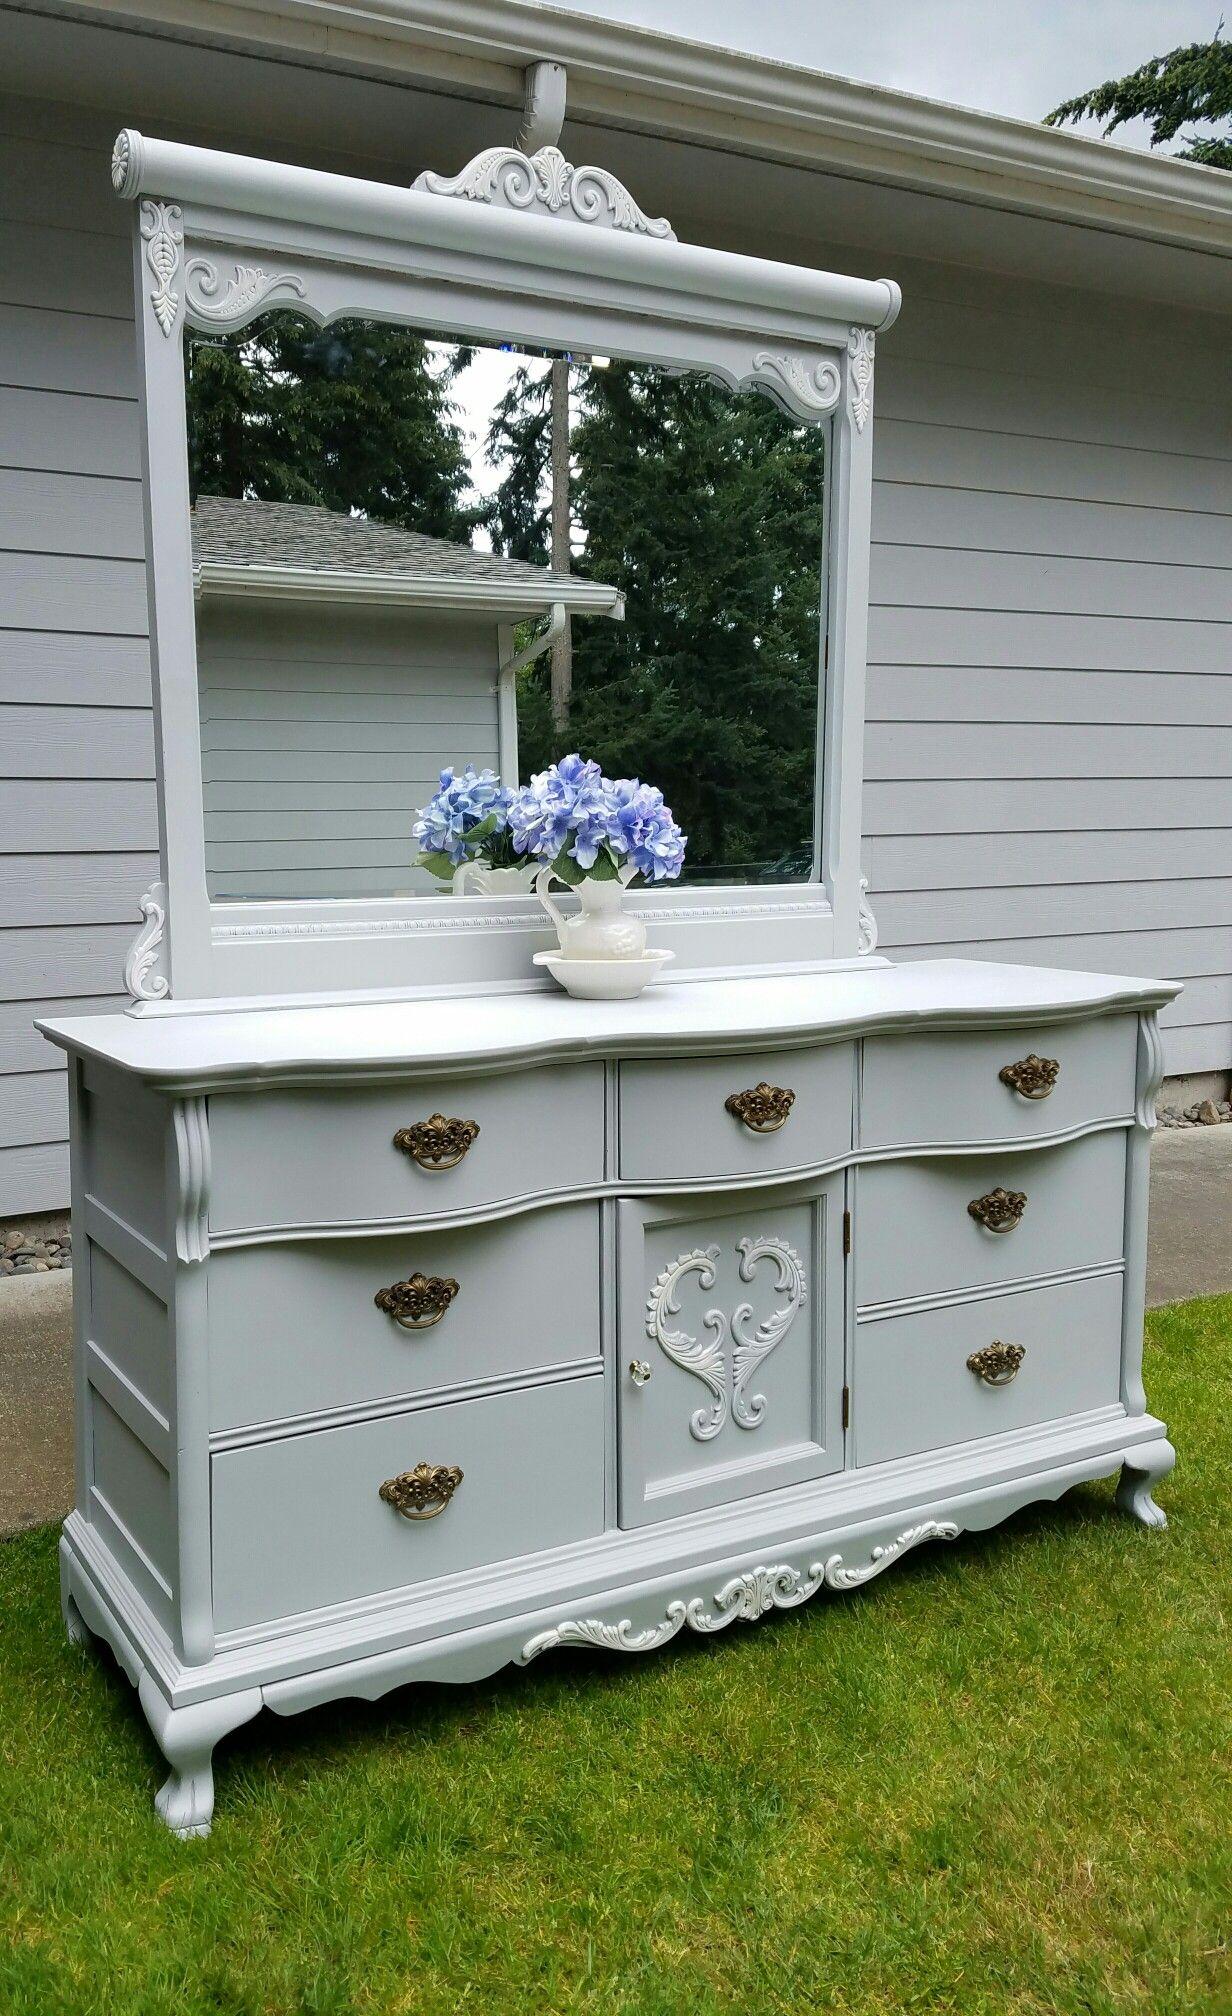 Lexington Victorian Sampler Collection Triple Dresser Fusion Mineral Paint Pebbles Anni Painting Furniture Diy Shabby Chic Paint Colours Painted Furniture